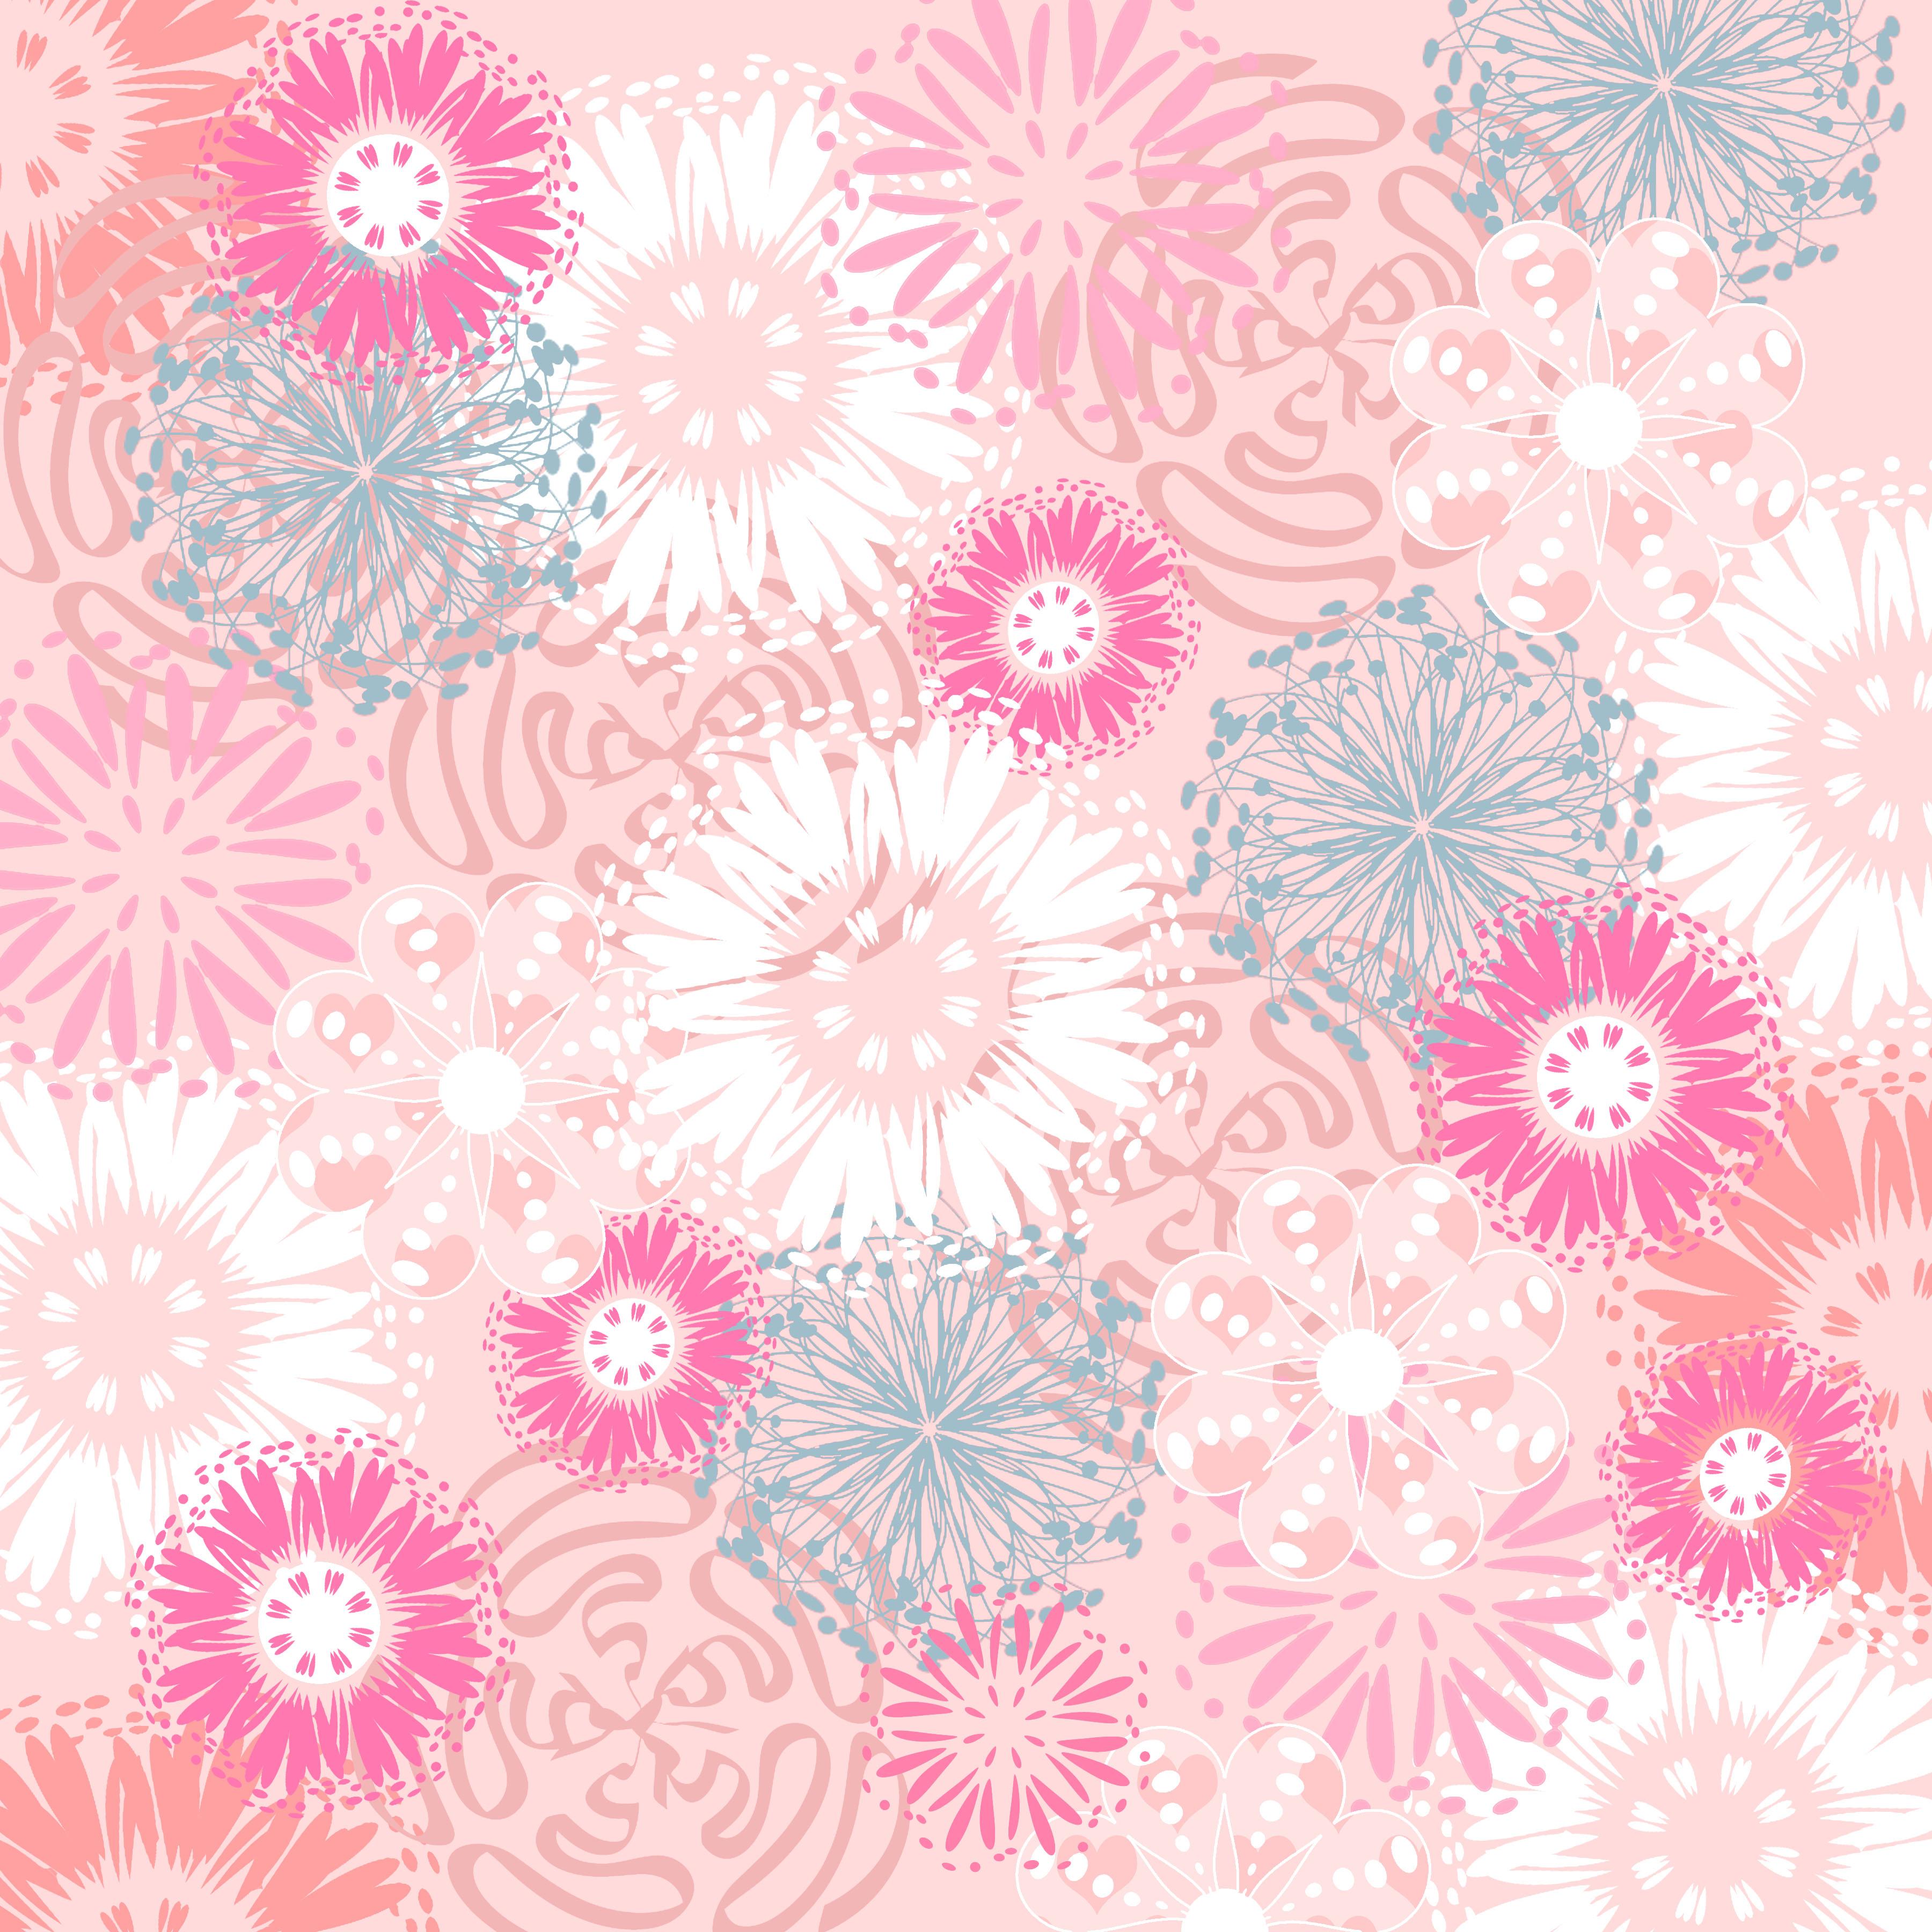 Download Backgrounds Paper Printables Sheet Backgrounds Wallpapers - Free Printable Backgrounds For Paper